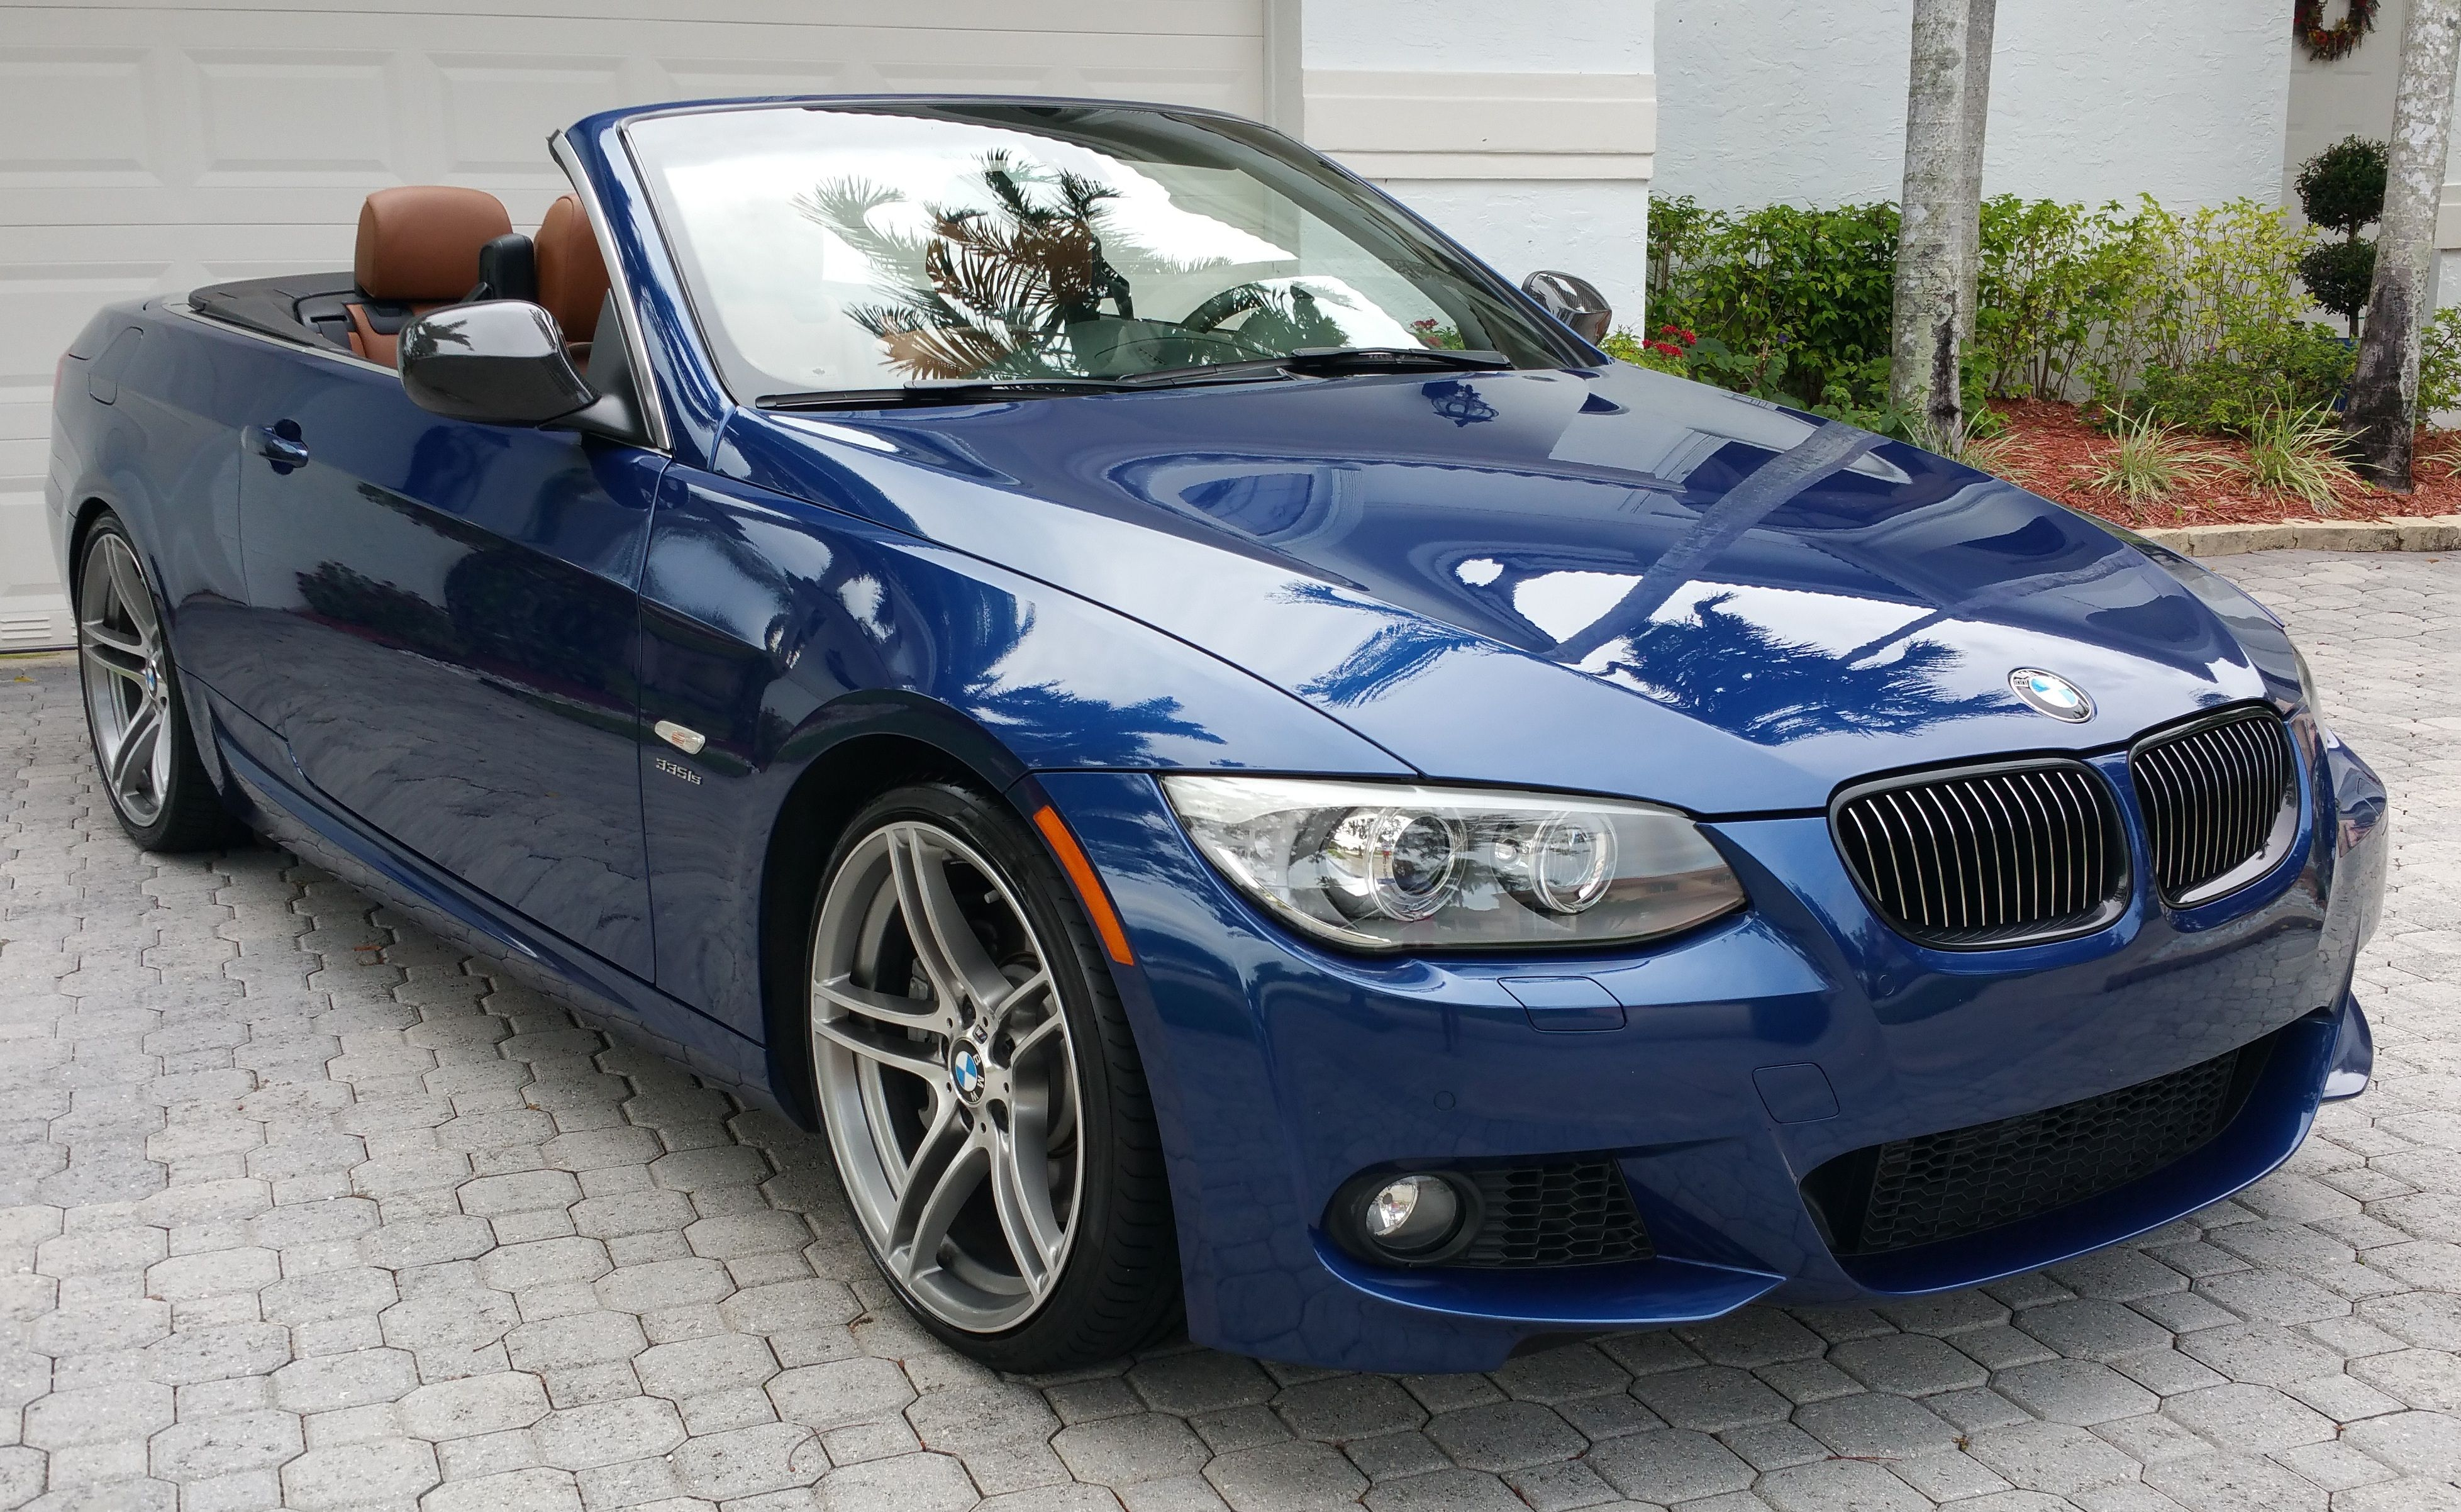 tx listings convertible for antonio san bmw used sale in series